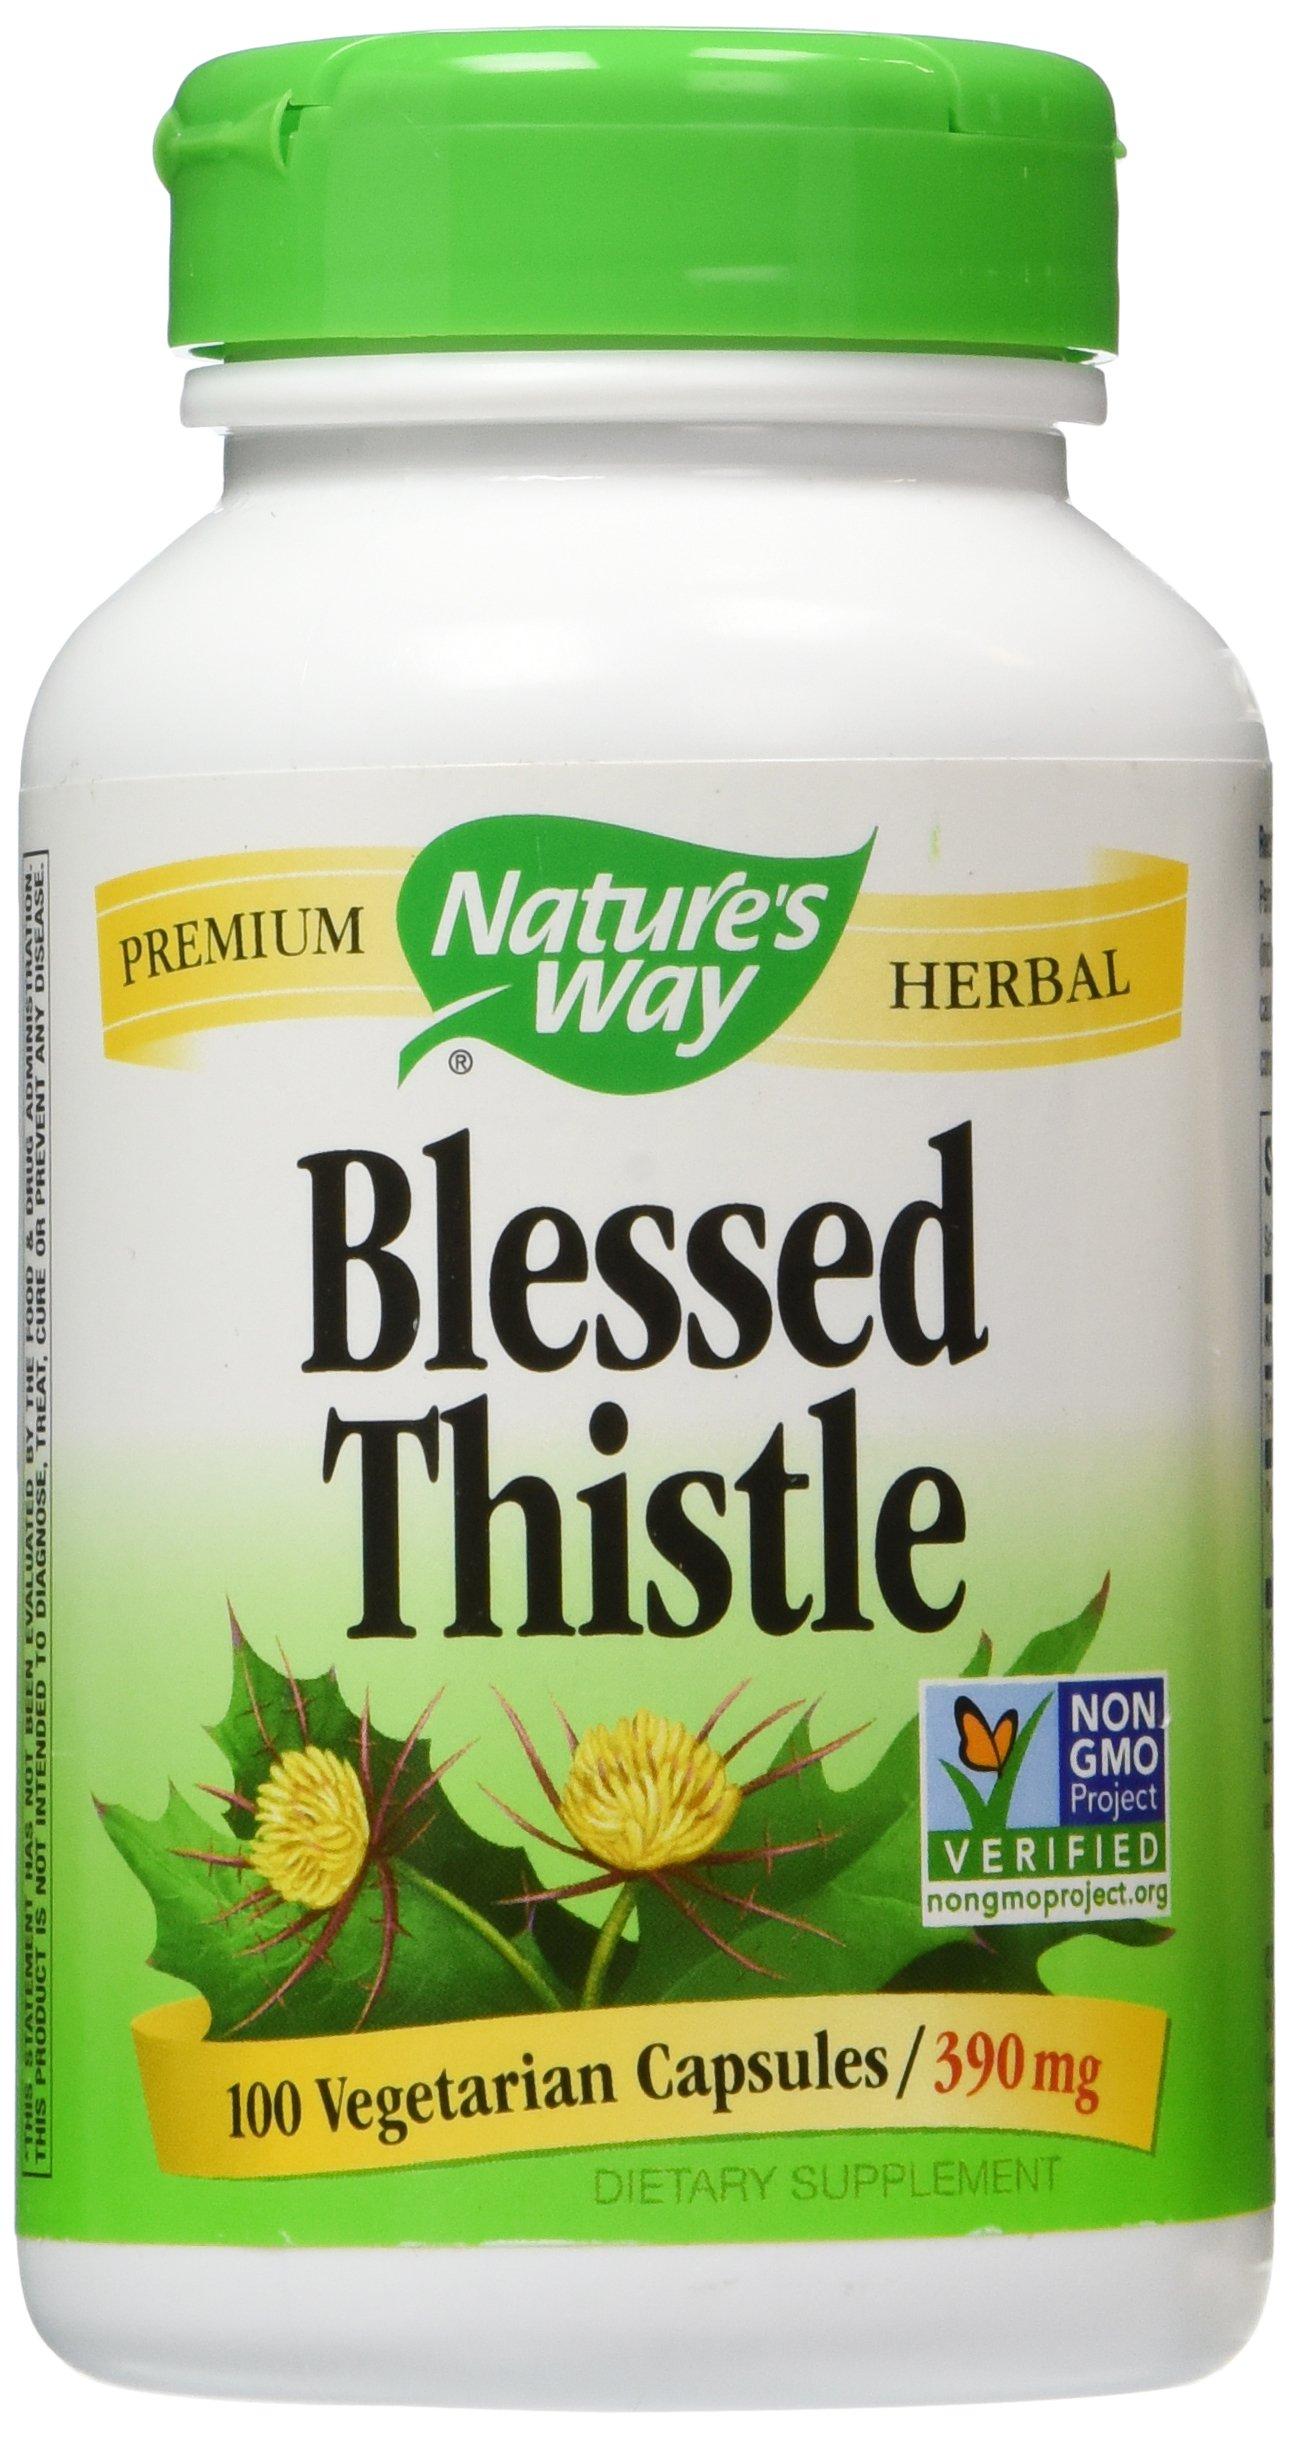 Natures Way Blessed Thistle, 390 milligrams Per Cap, 100 Vegetarian Capsules